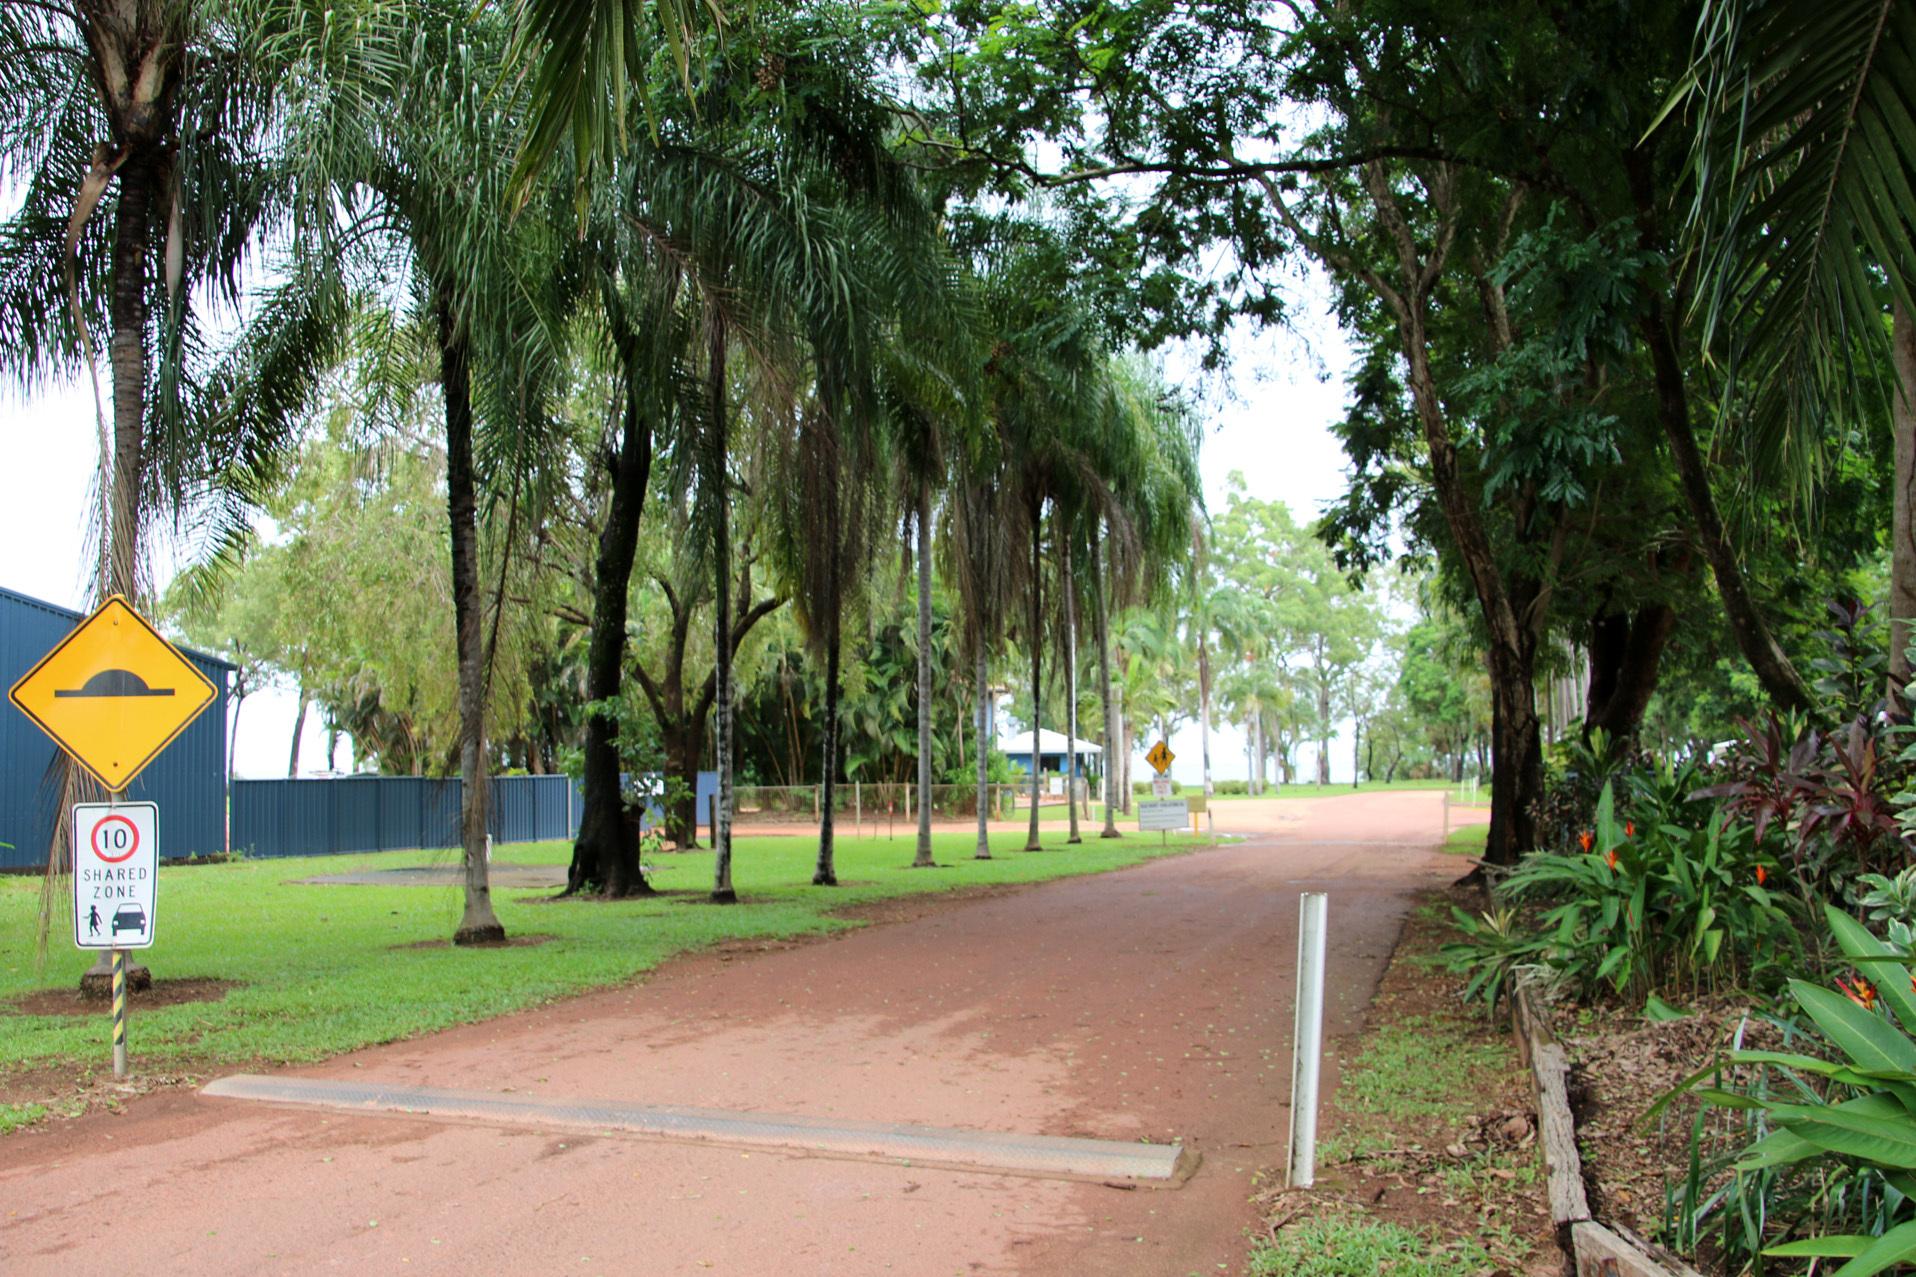 d - Weipa Caravan Park & Camping Ground